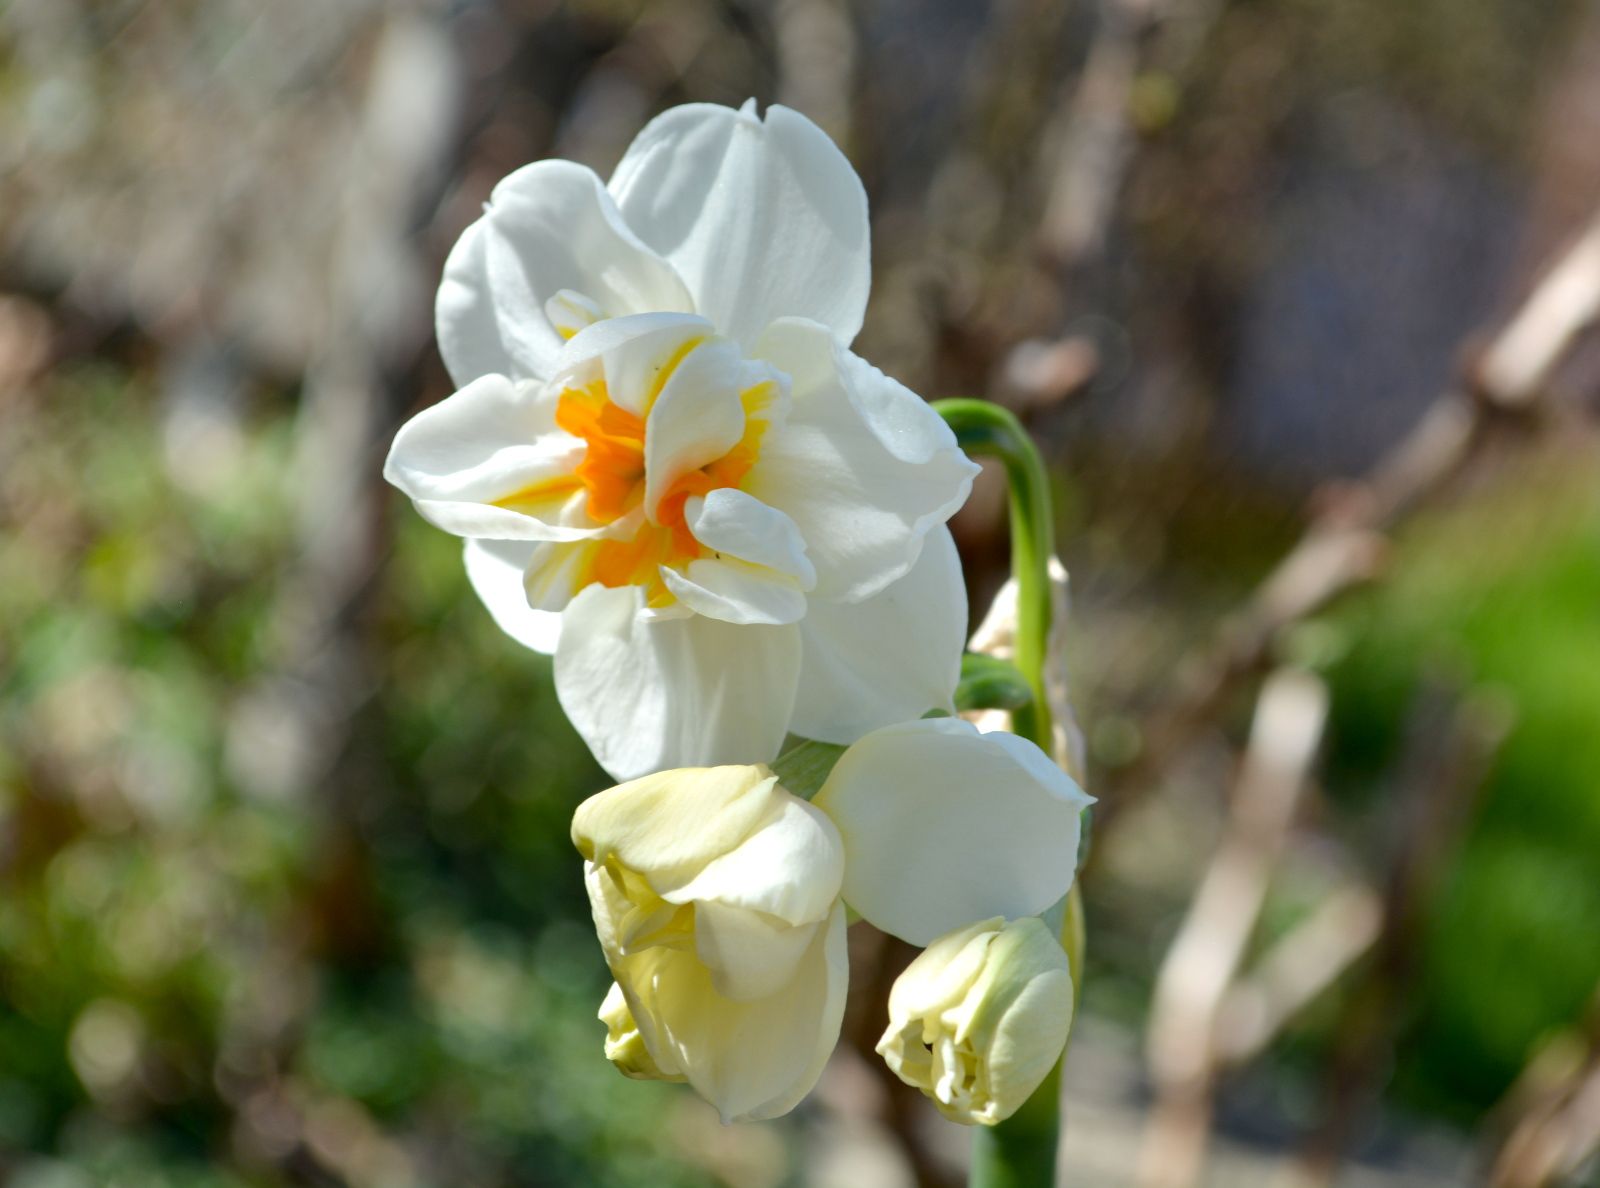 cozy birdhouse | daffodils